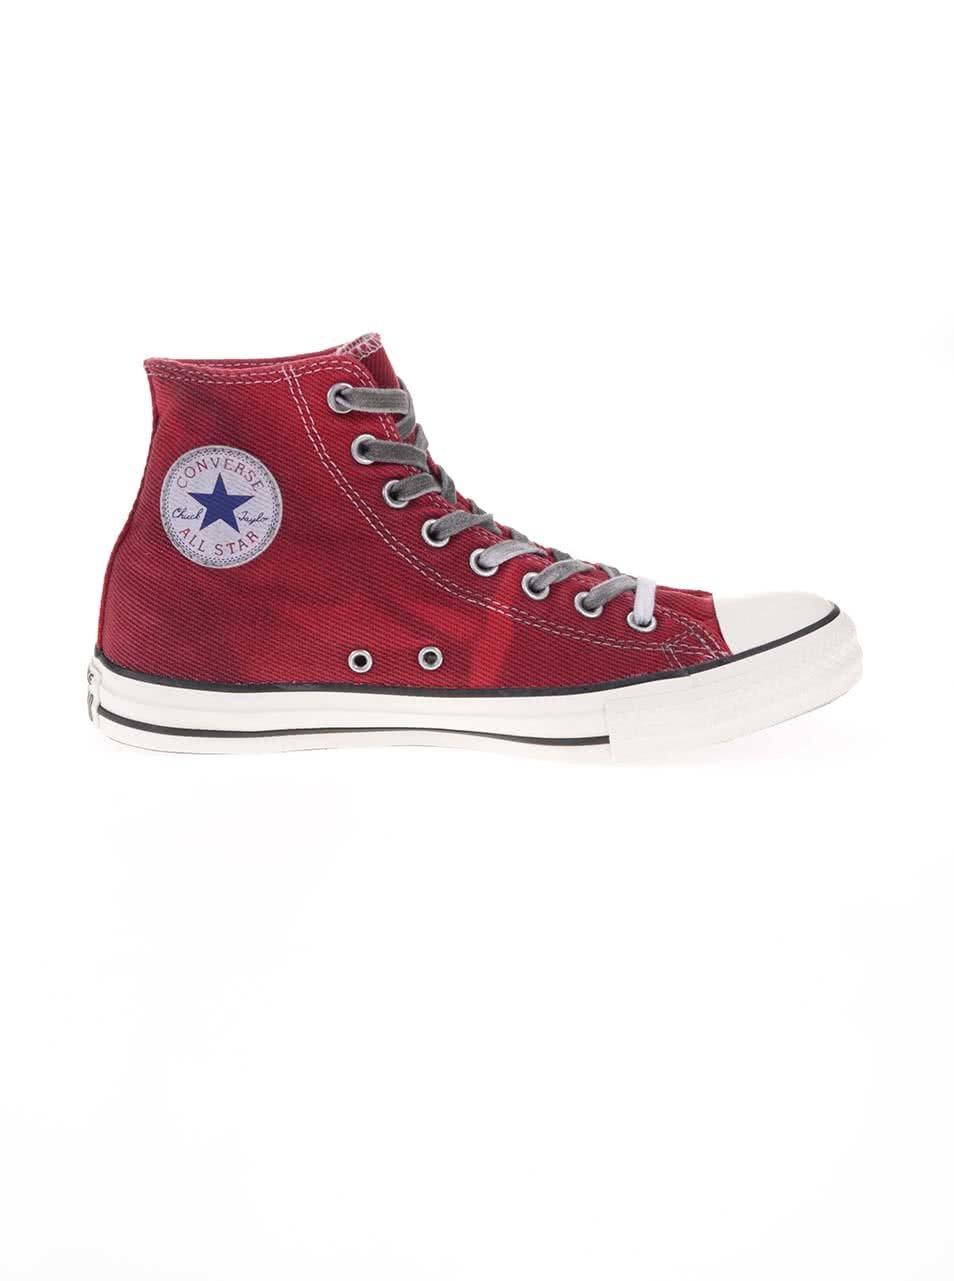 Červené pánské kotníkové tenisky Converse Chuck Taylor All Star ... 3d9ea3ad8f